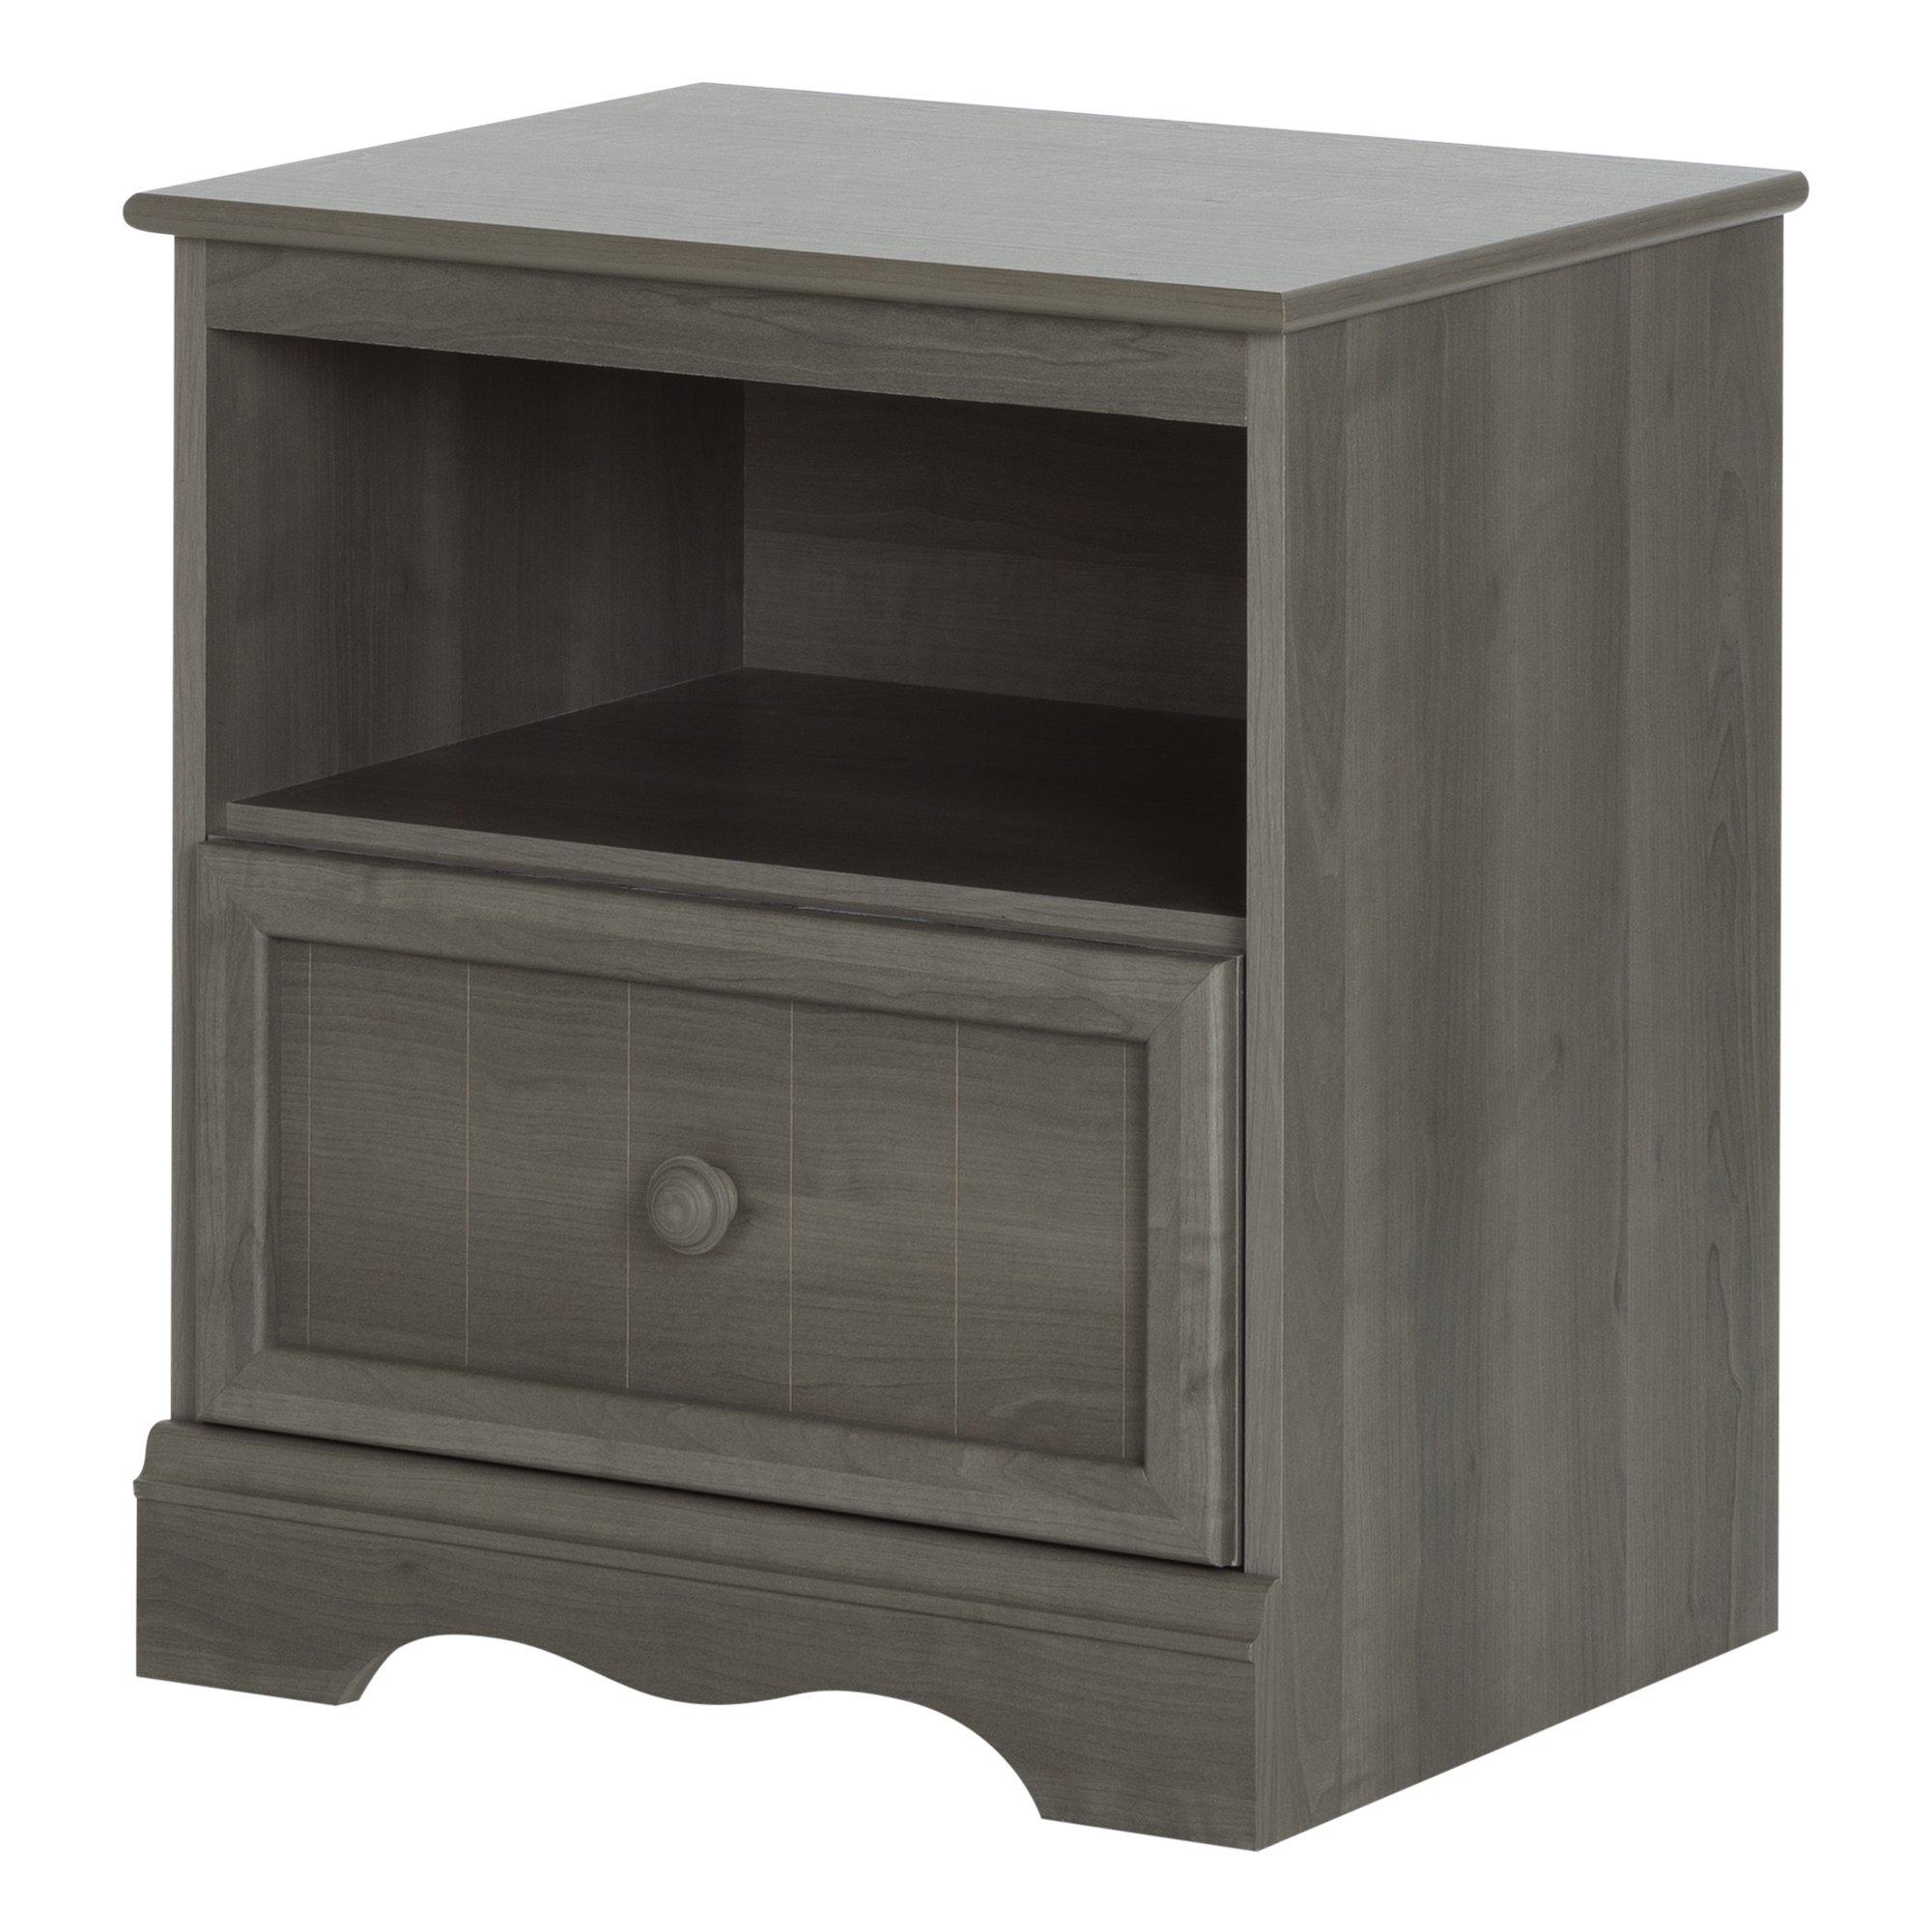 South Shore Savannah 1-Drawer Nightstand, Gray Maple